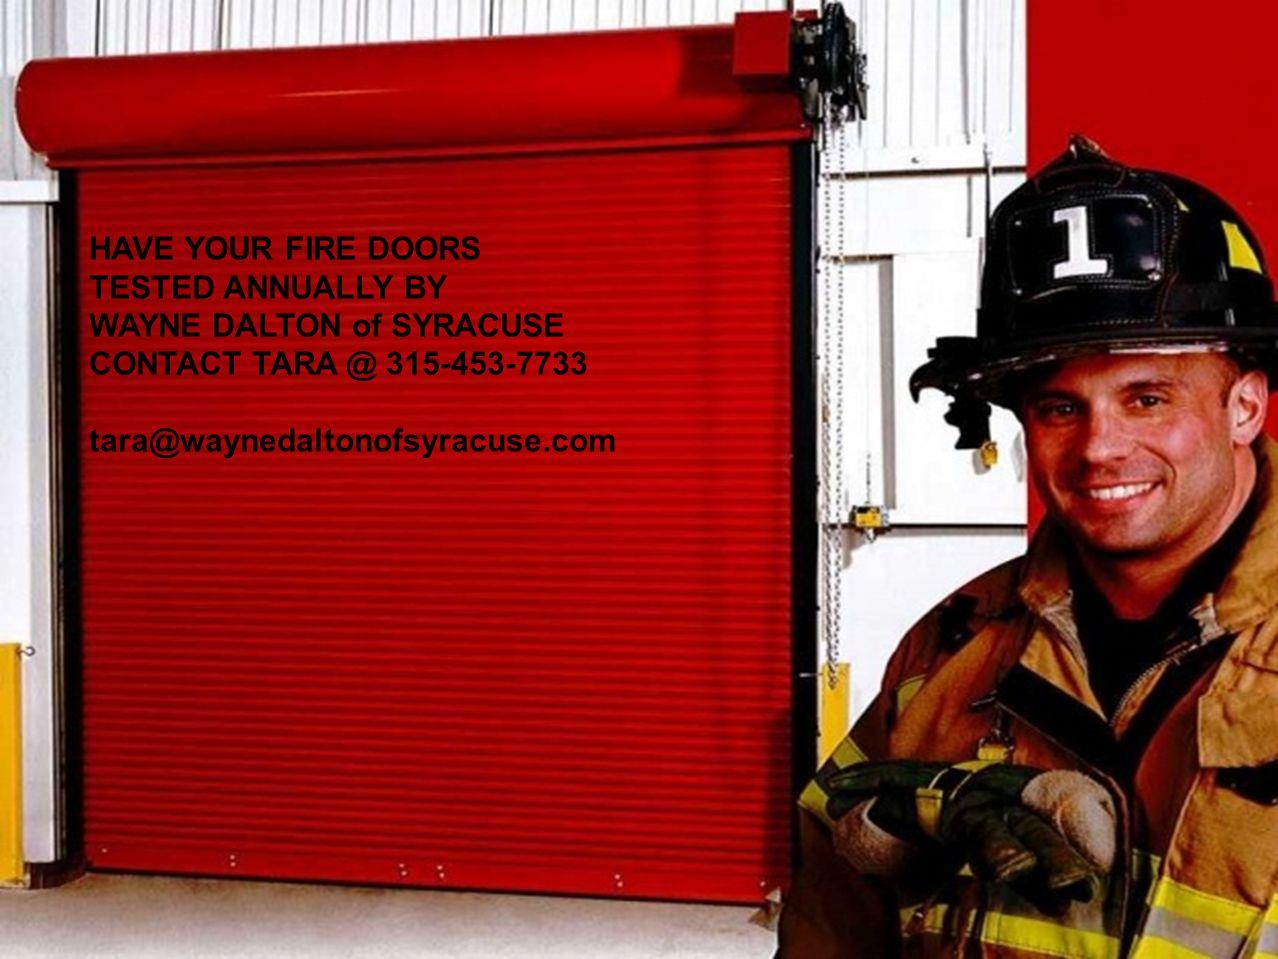 HAVE YOUR FIRE DOORS TESTED ANNUALLY BY WAYNE DALTON of SYRACUSE CONTACT TARA @ 315-453-7733 tara@waynedaltonofsyracuse.com